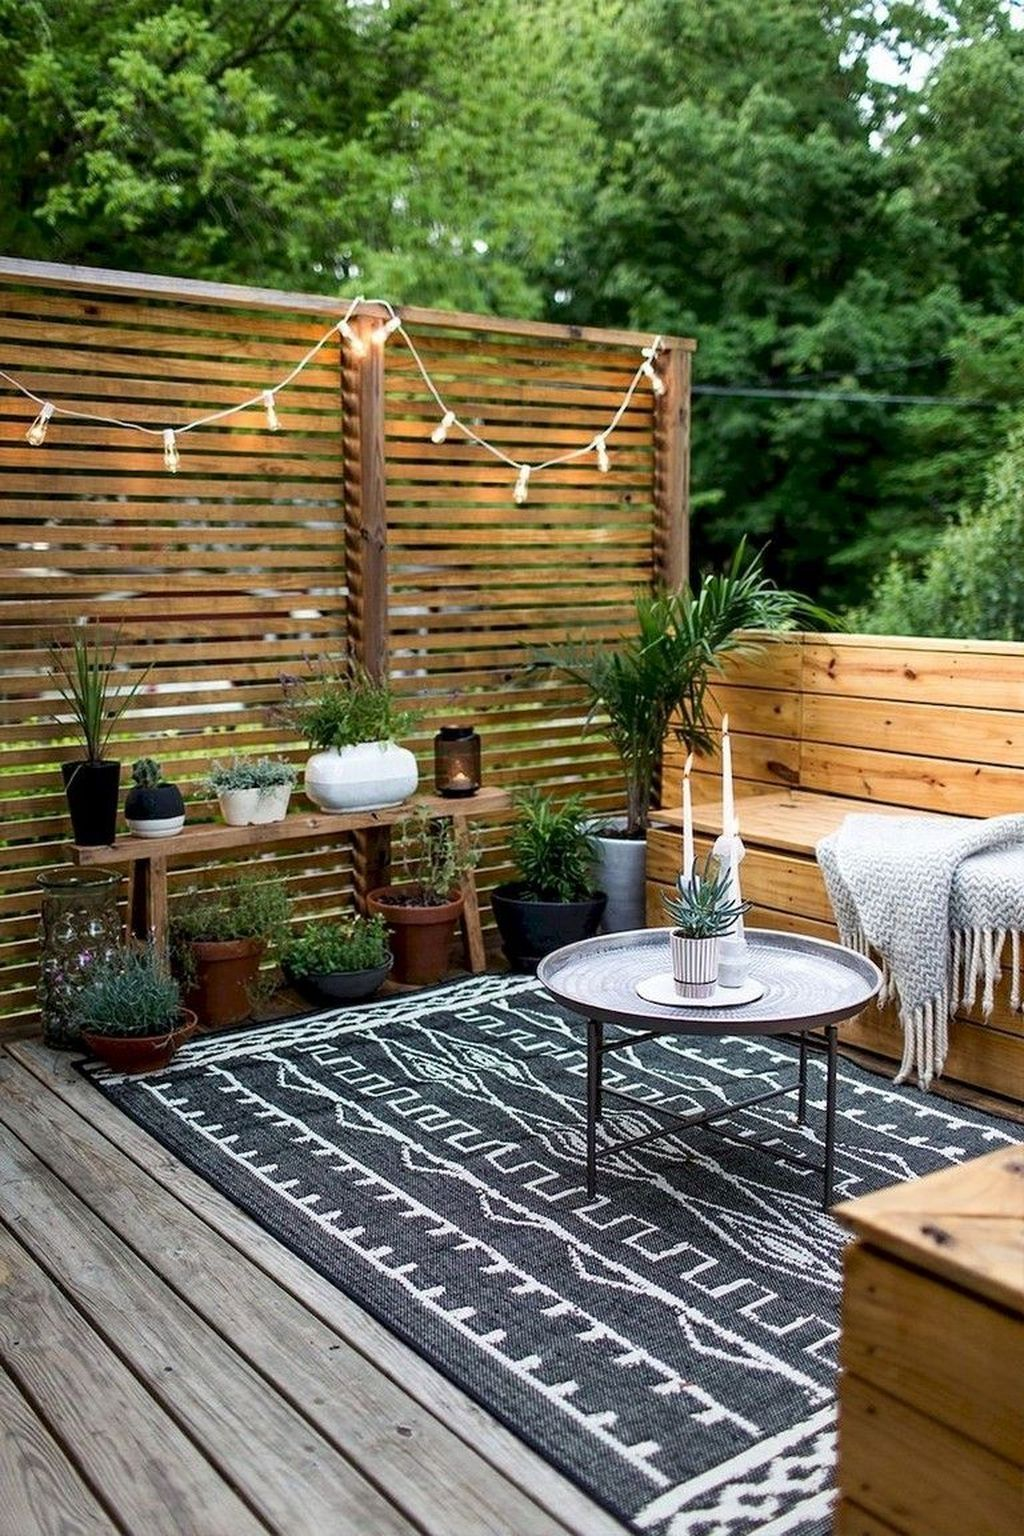 42 popular small backyard patio design ideas small on modern deck patio ideas for backyard design and decoration ideas id=73618